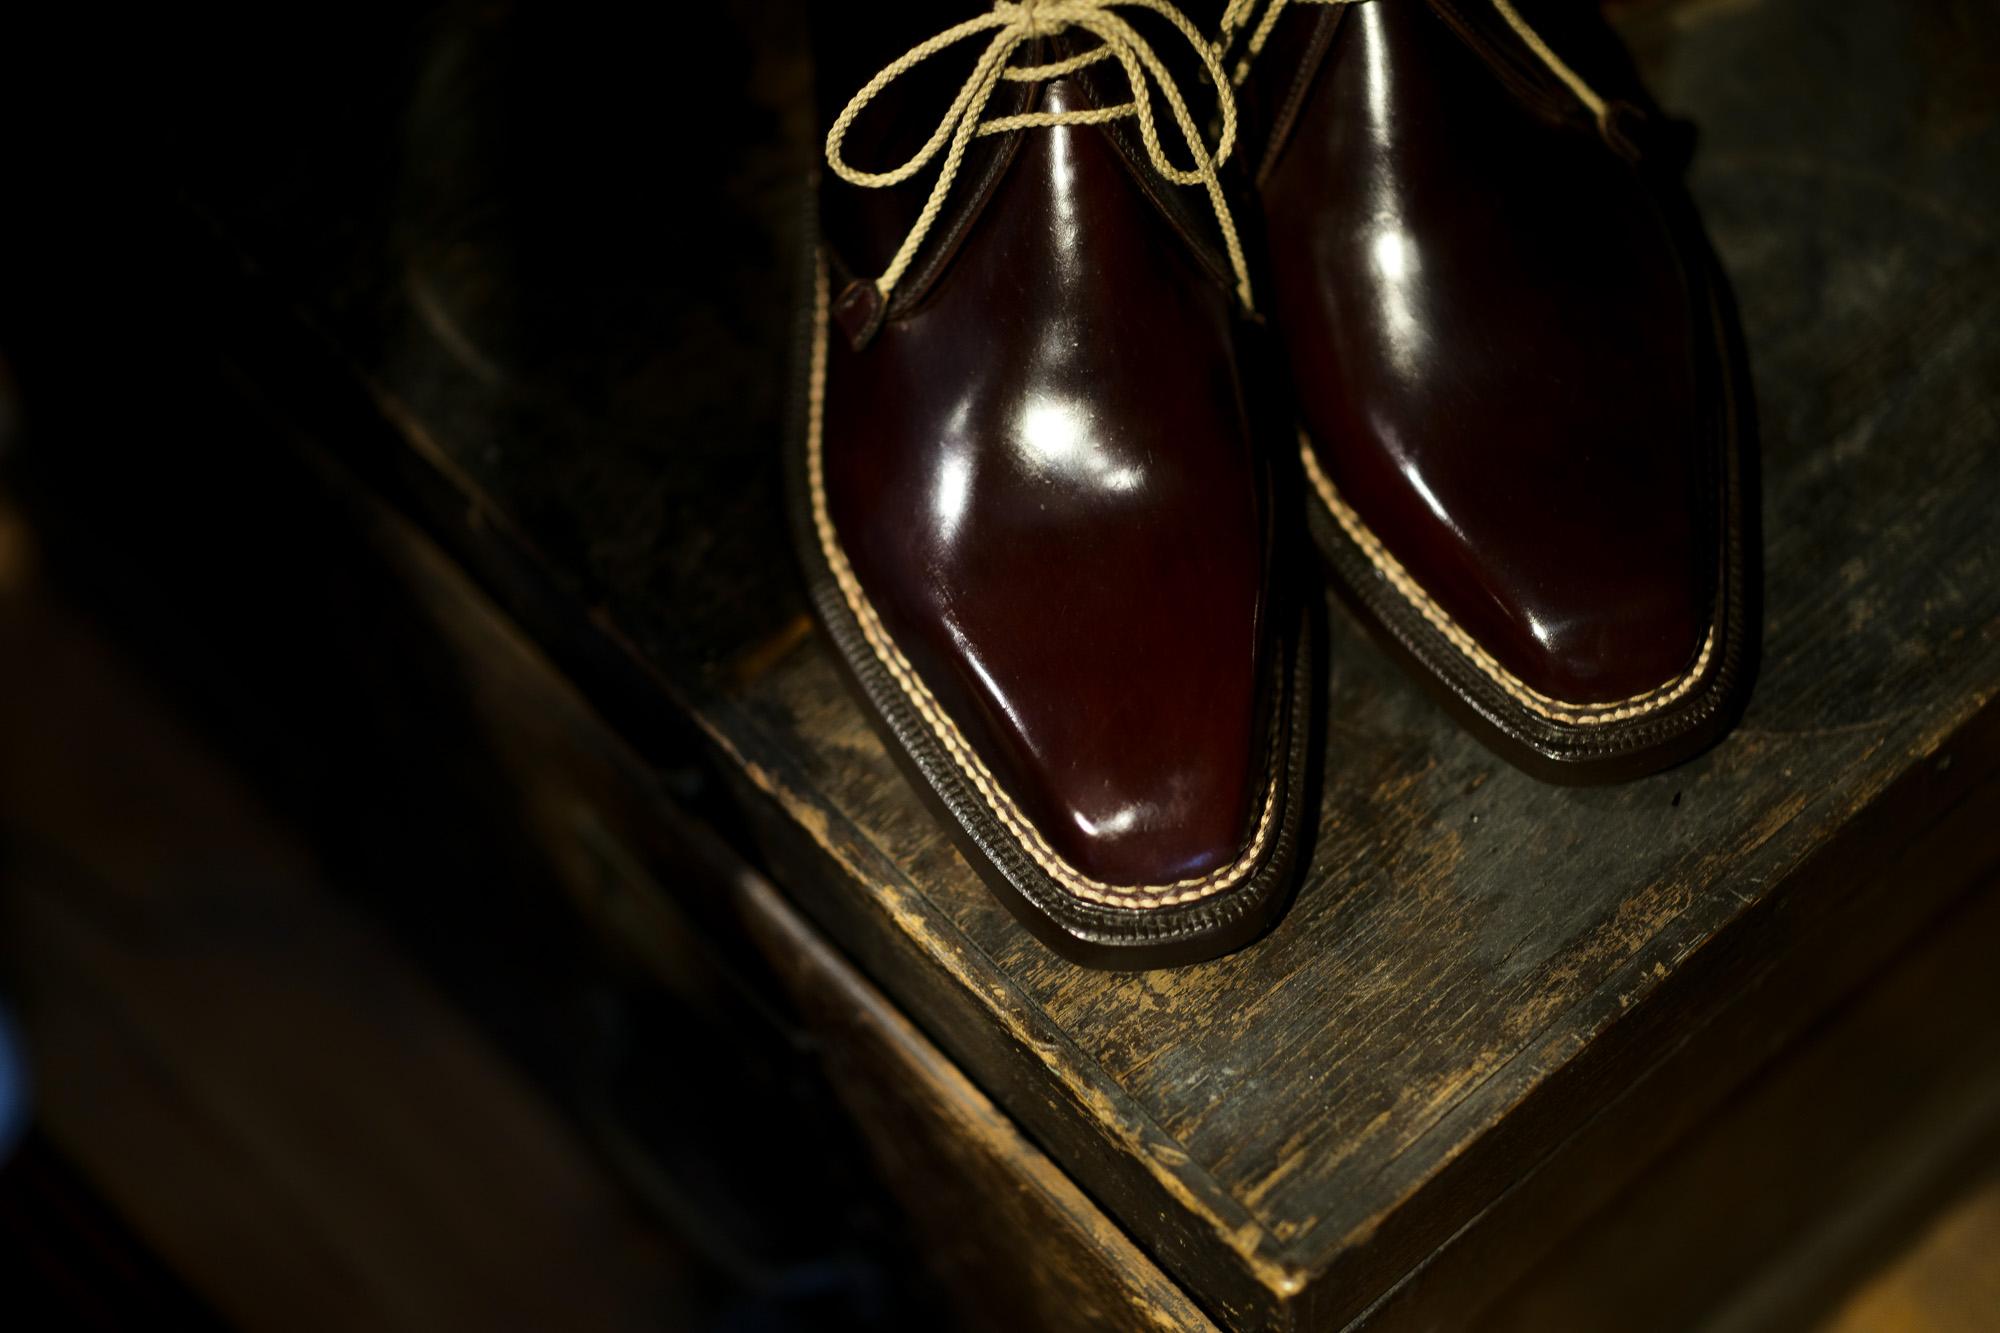 ENZO BONAFE(エンツォボナフェ) ART.3722 Chukka boots Horween Shell Cordovan Leather ホーウィン社 シェルコードバンレザー チャッカブーツ コードバンブーツ No.8(バーガンディー) made in italy (イタリア製) 2021 愛知 名古屋 Alto e Diritto altoediritto アルトエデリット レザーブーツ